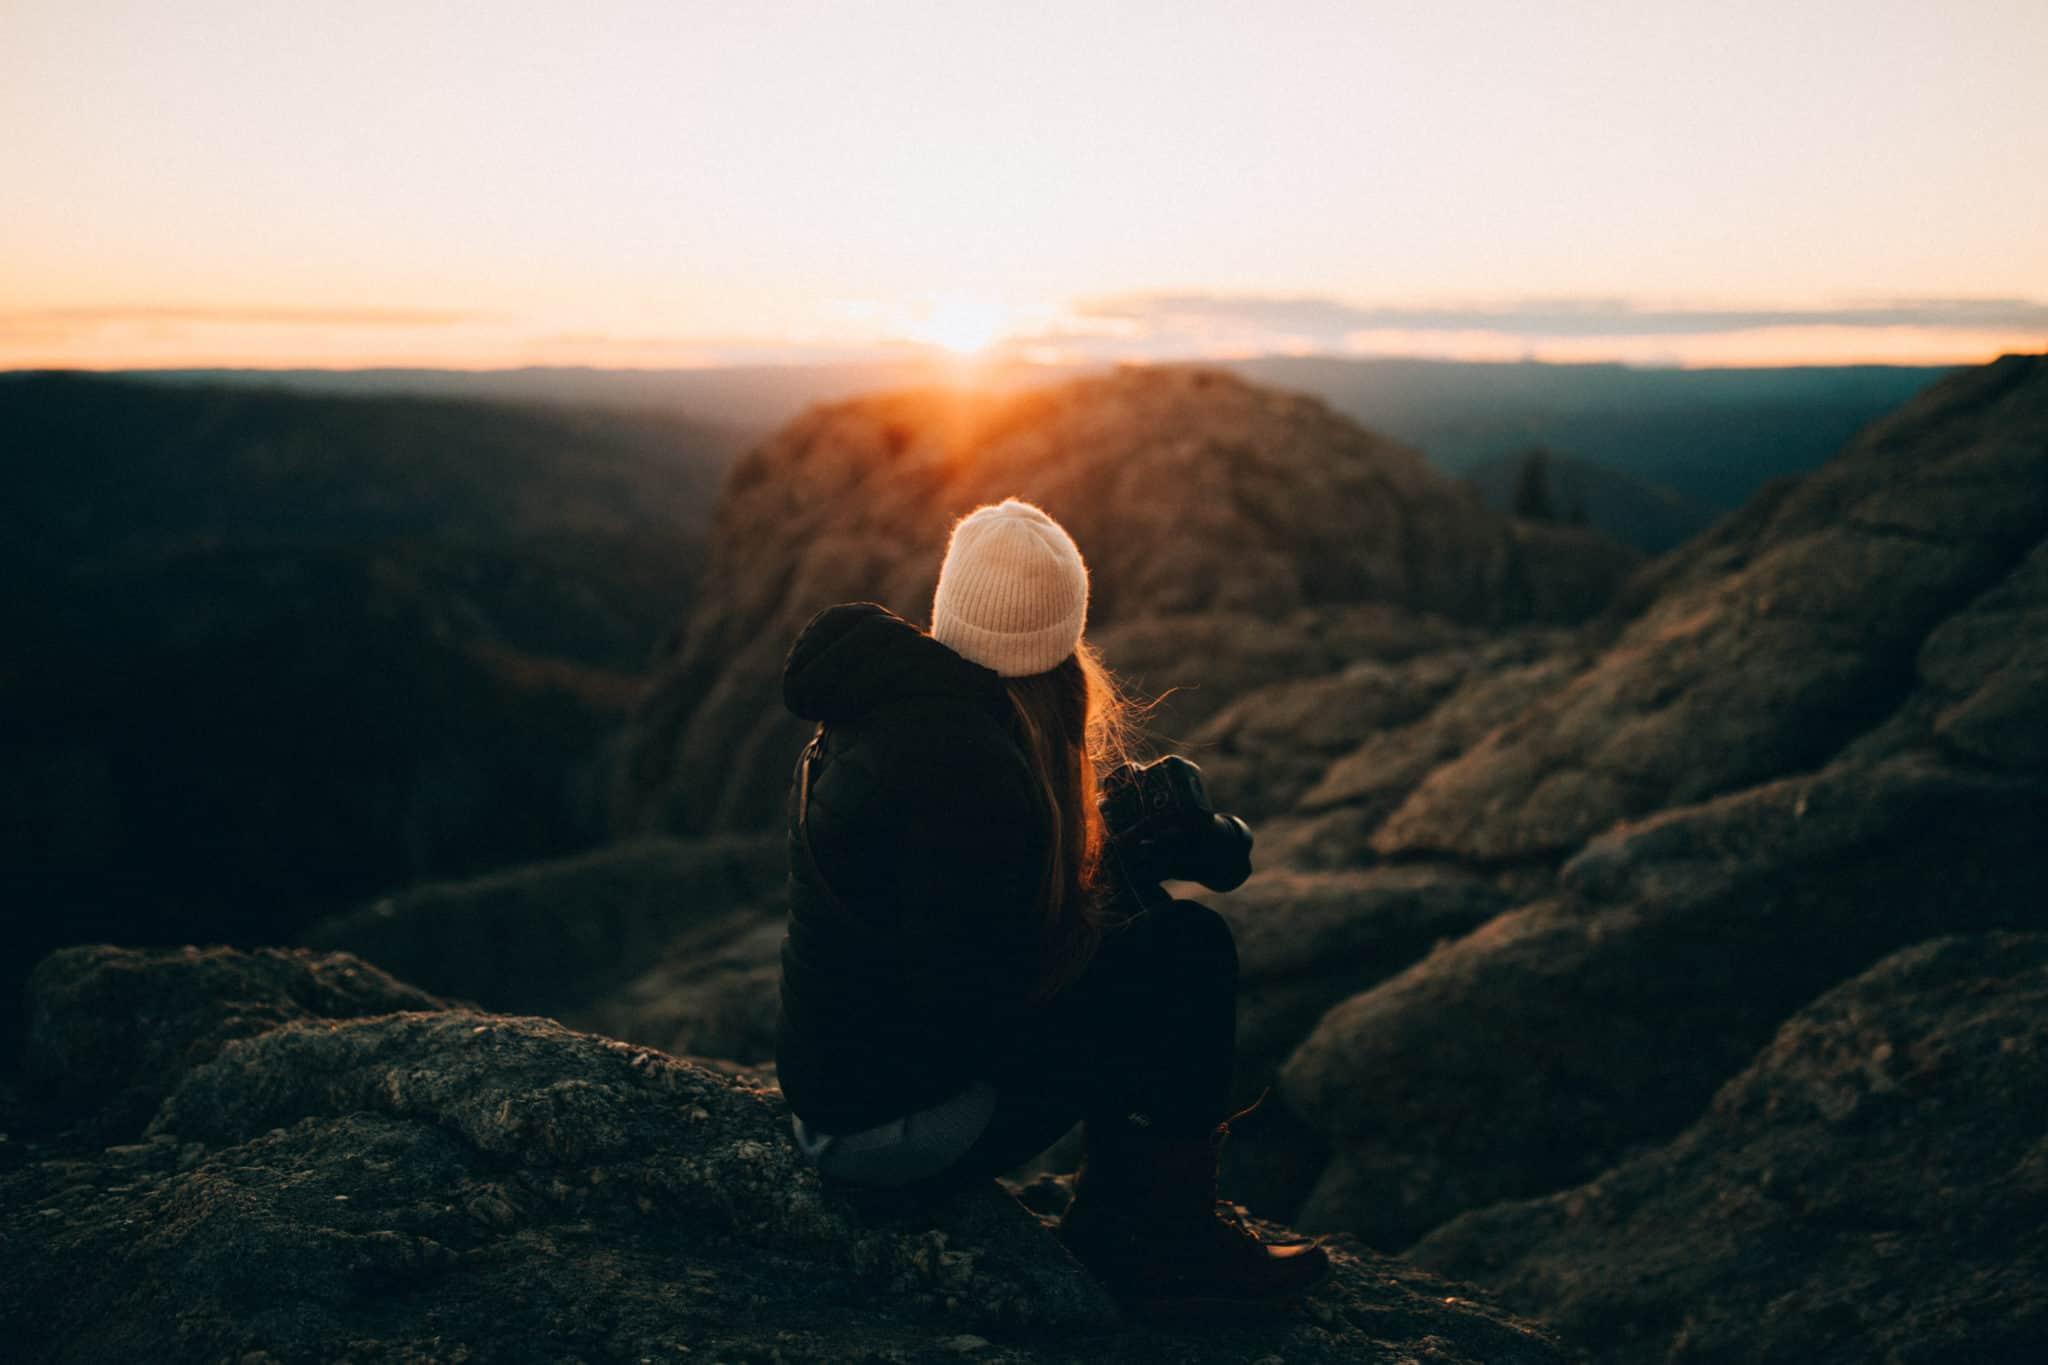 Black Elk Peak Trail sunset at the top, Emily Mandagie